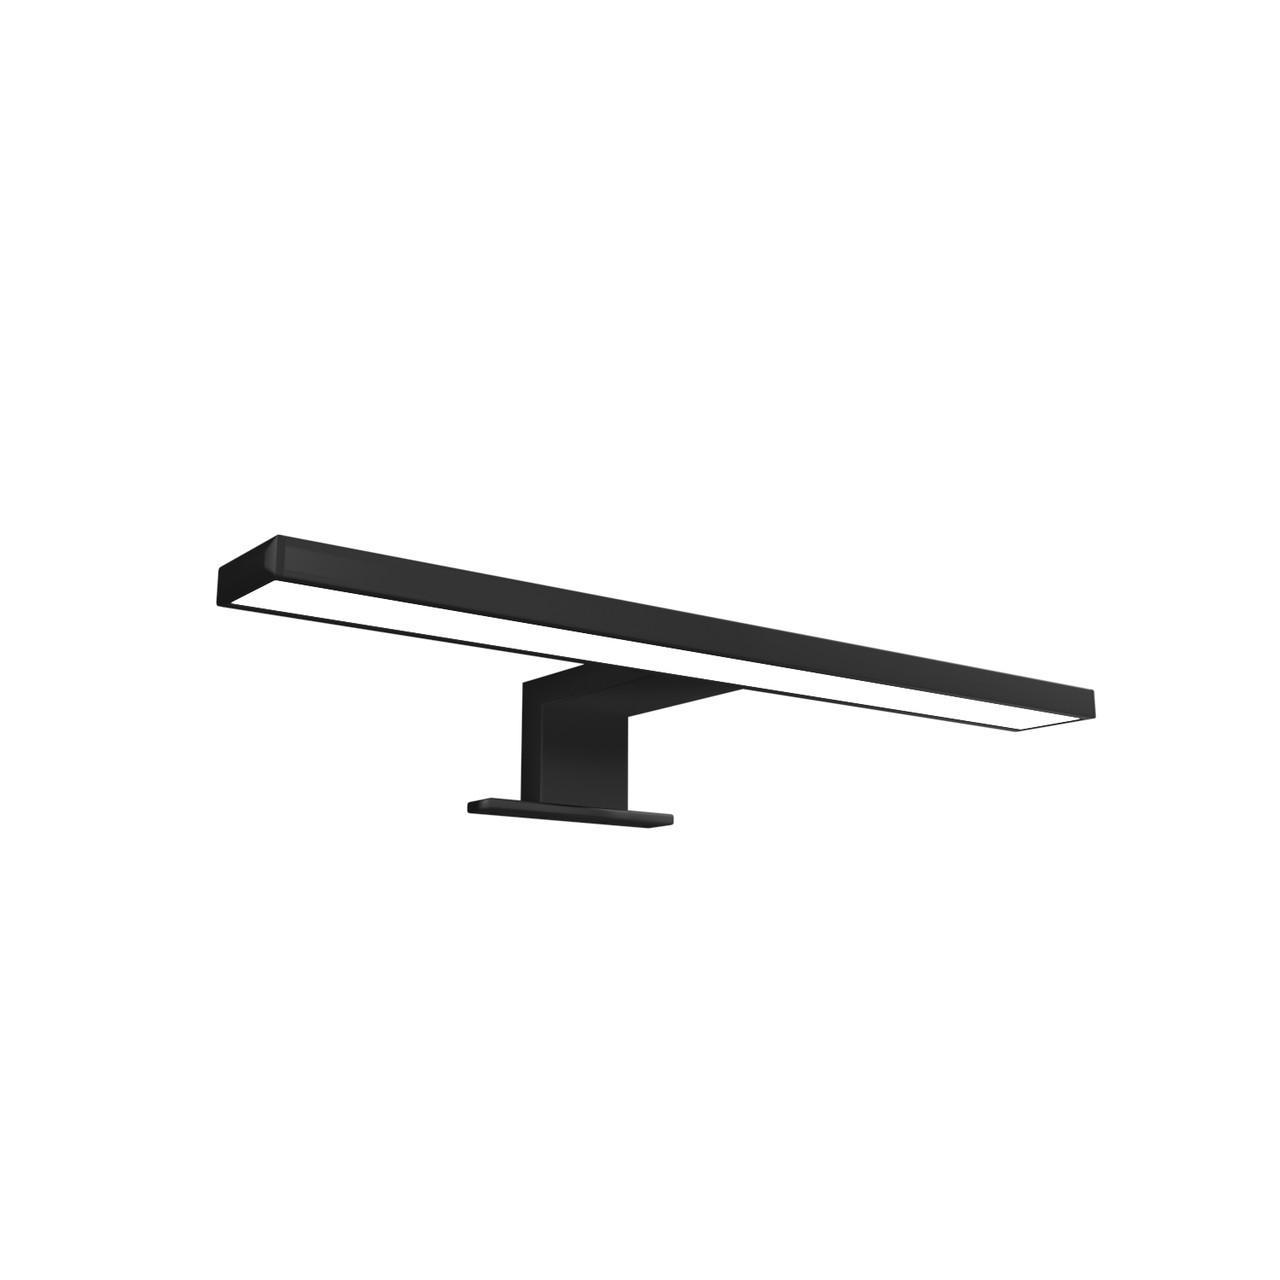 Светильник LED для ванной Sanwerk «SMART» black AL 30 см